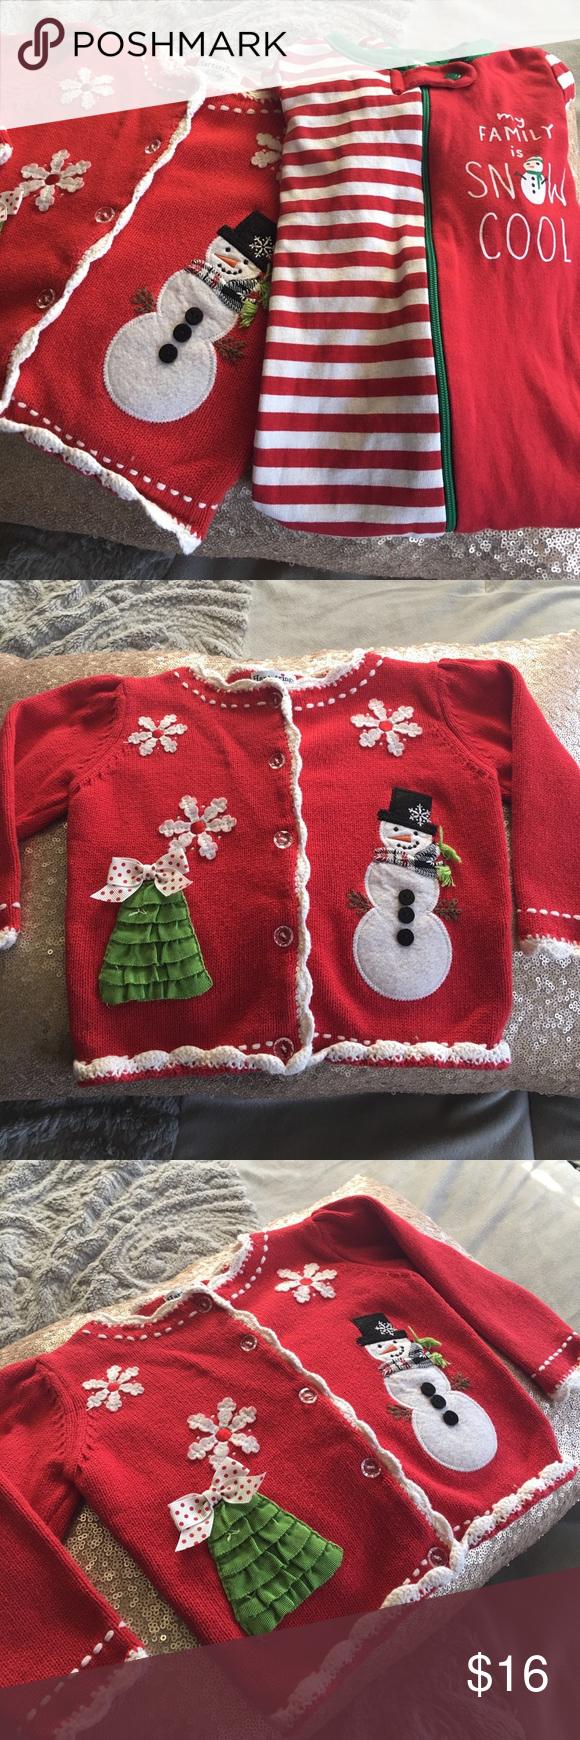 6eca7eac2 Christmas Bundle for 12 month old. Cardigan PJs Adorable Christmas ...